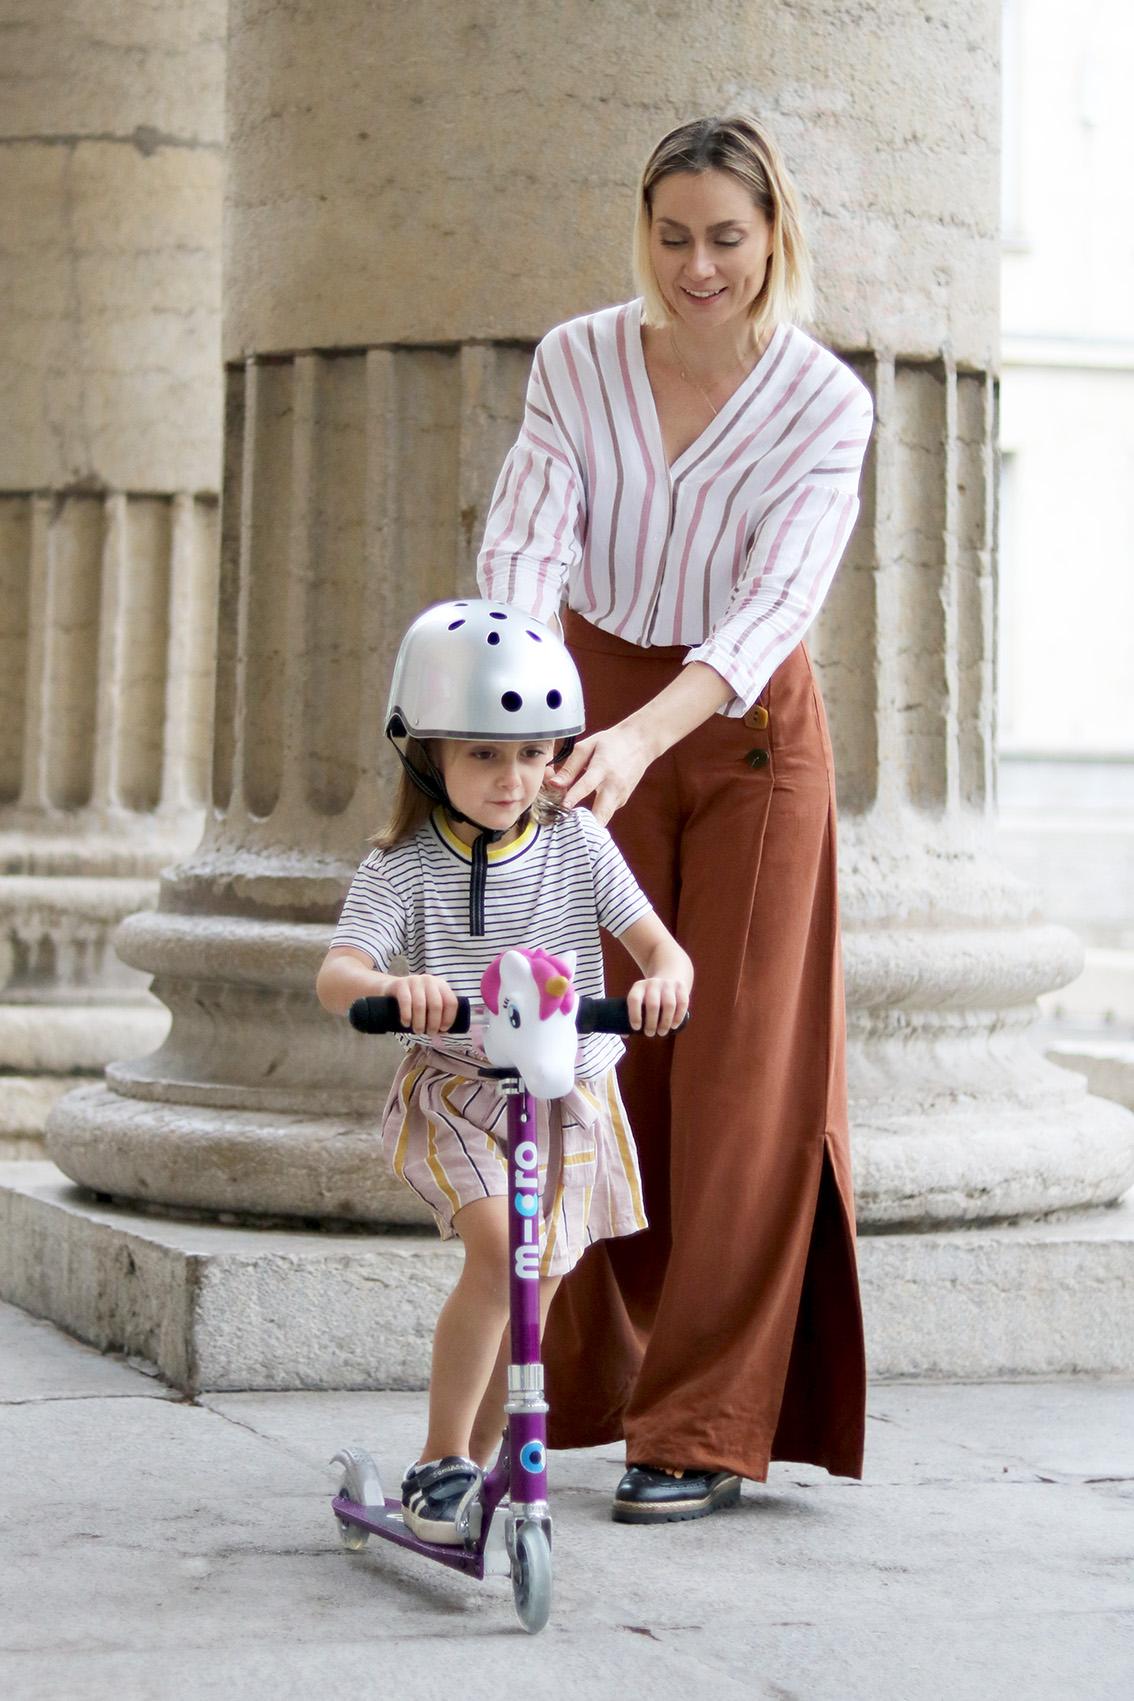 trottinette-enfant-micro-mobility